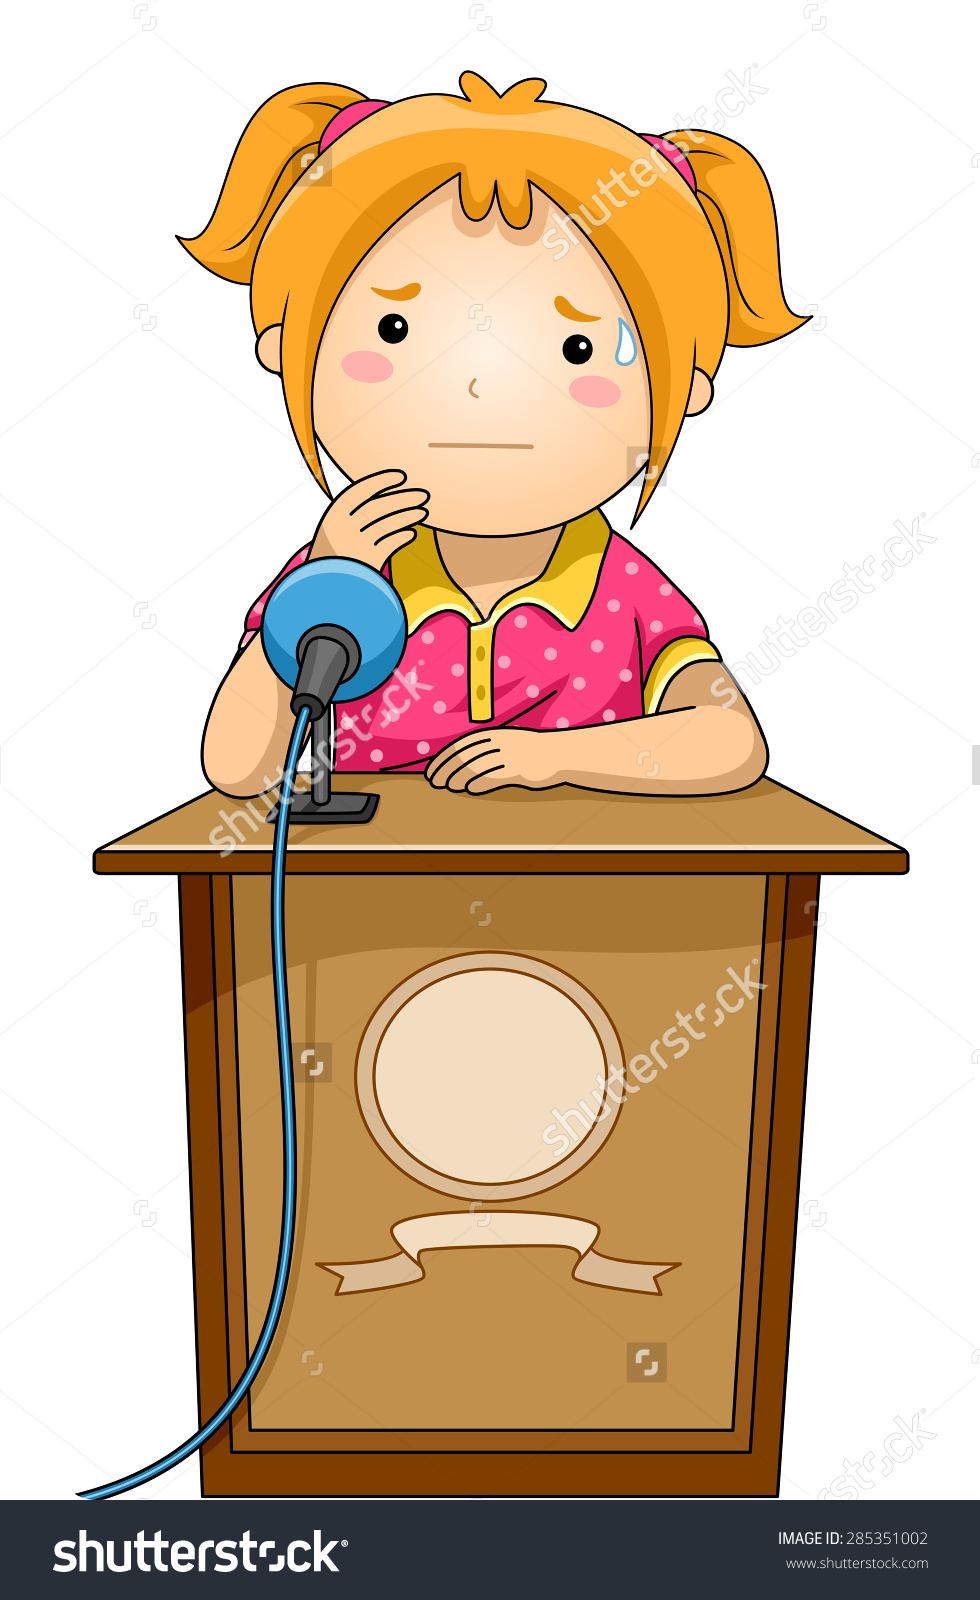 Clipart podium gratuit clip art library library Girl behind podium clipart - ClipartFox clip art library library